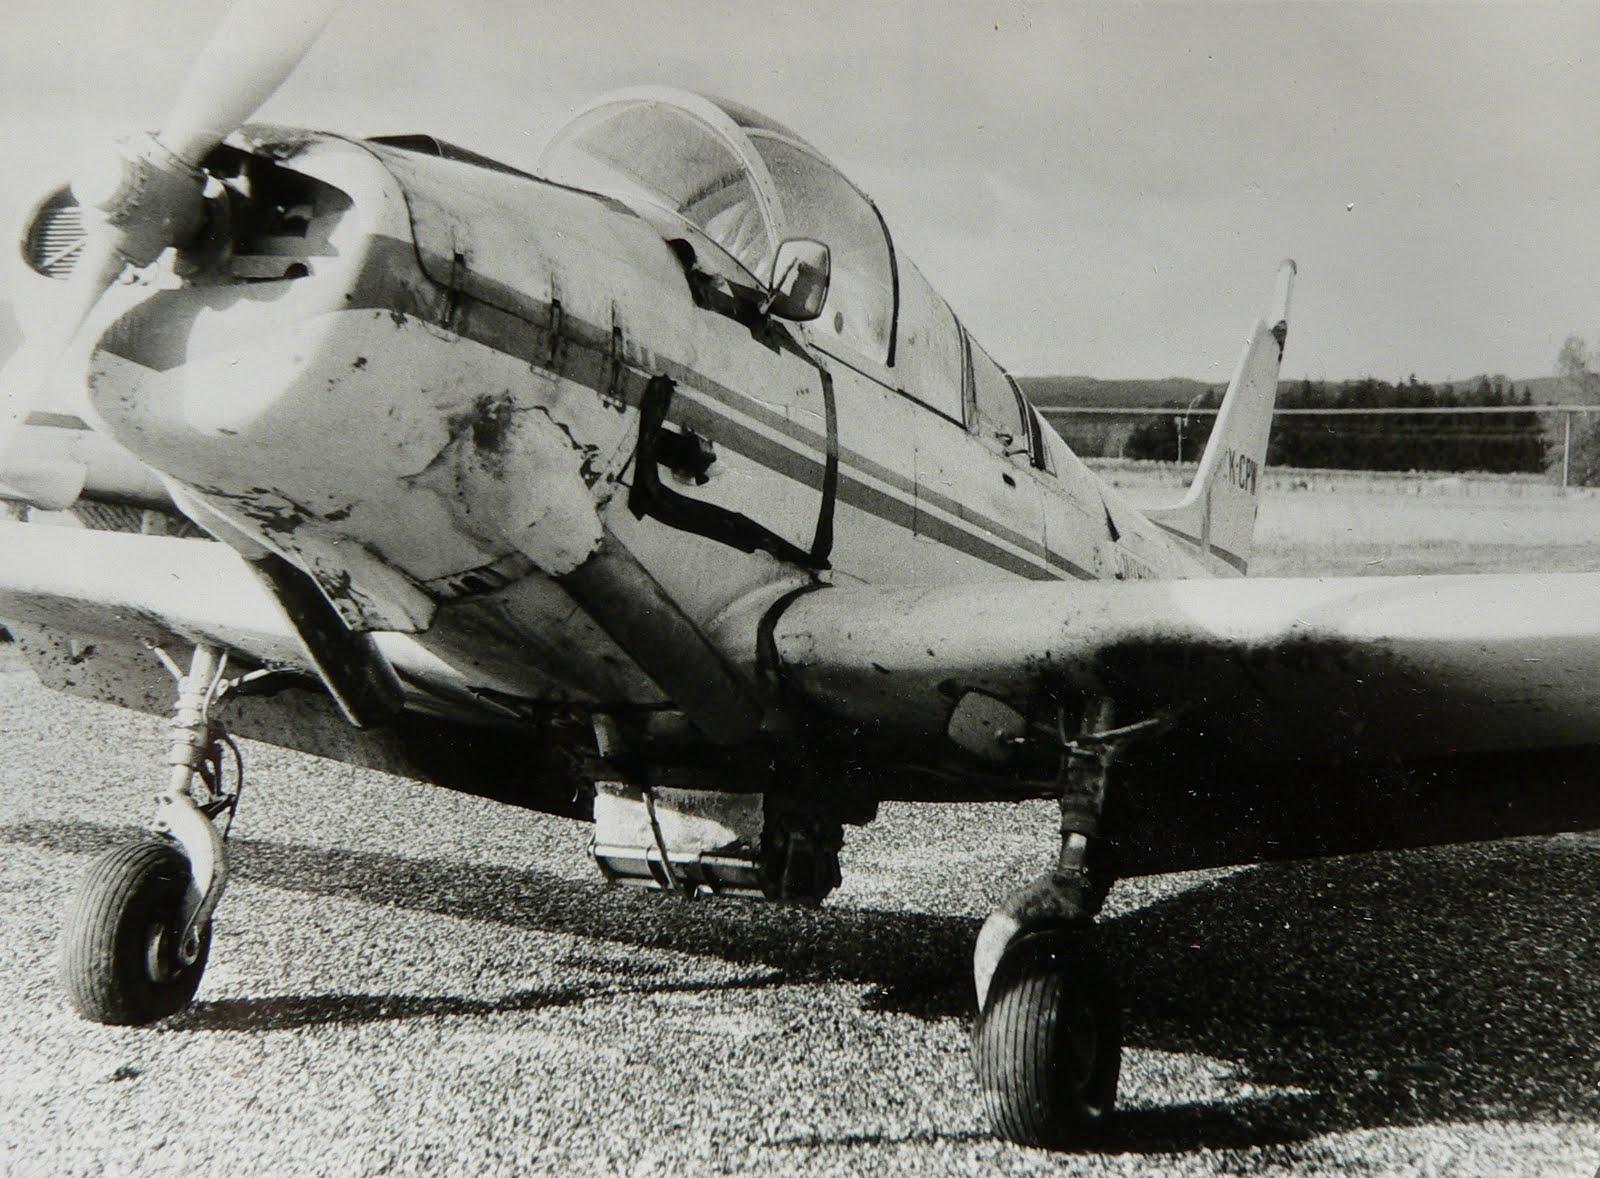 Yeoman Ya 1 Cropmaster 250r Zk Cpw Design Plane 04 Pesawat Remote Kontrol Photo Four And Five Were Taken On 01 1980 Also At Gore